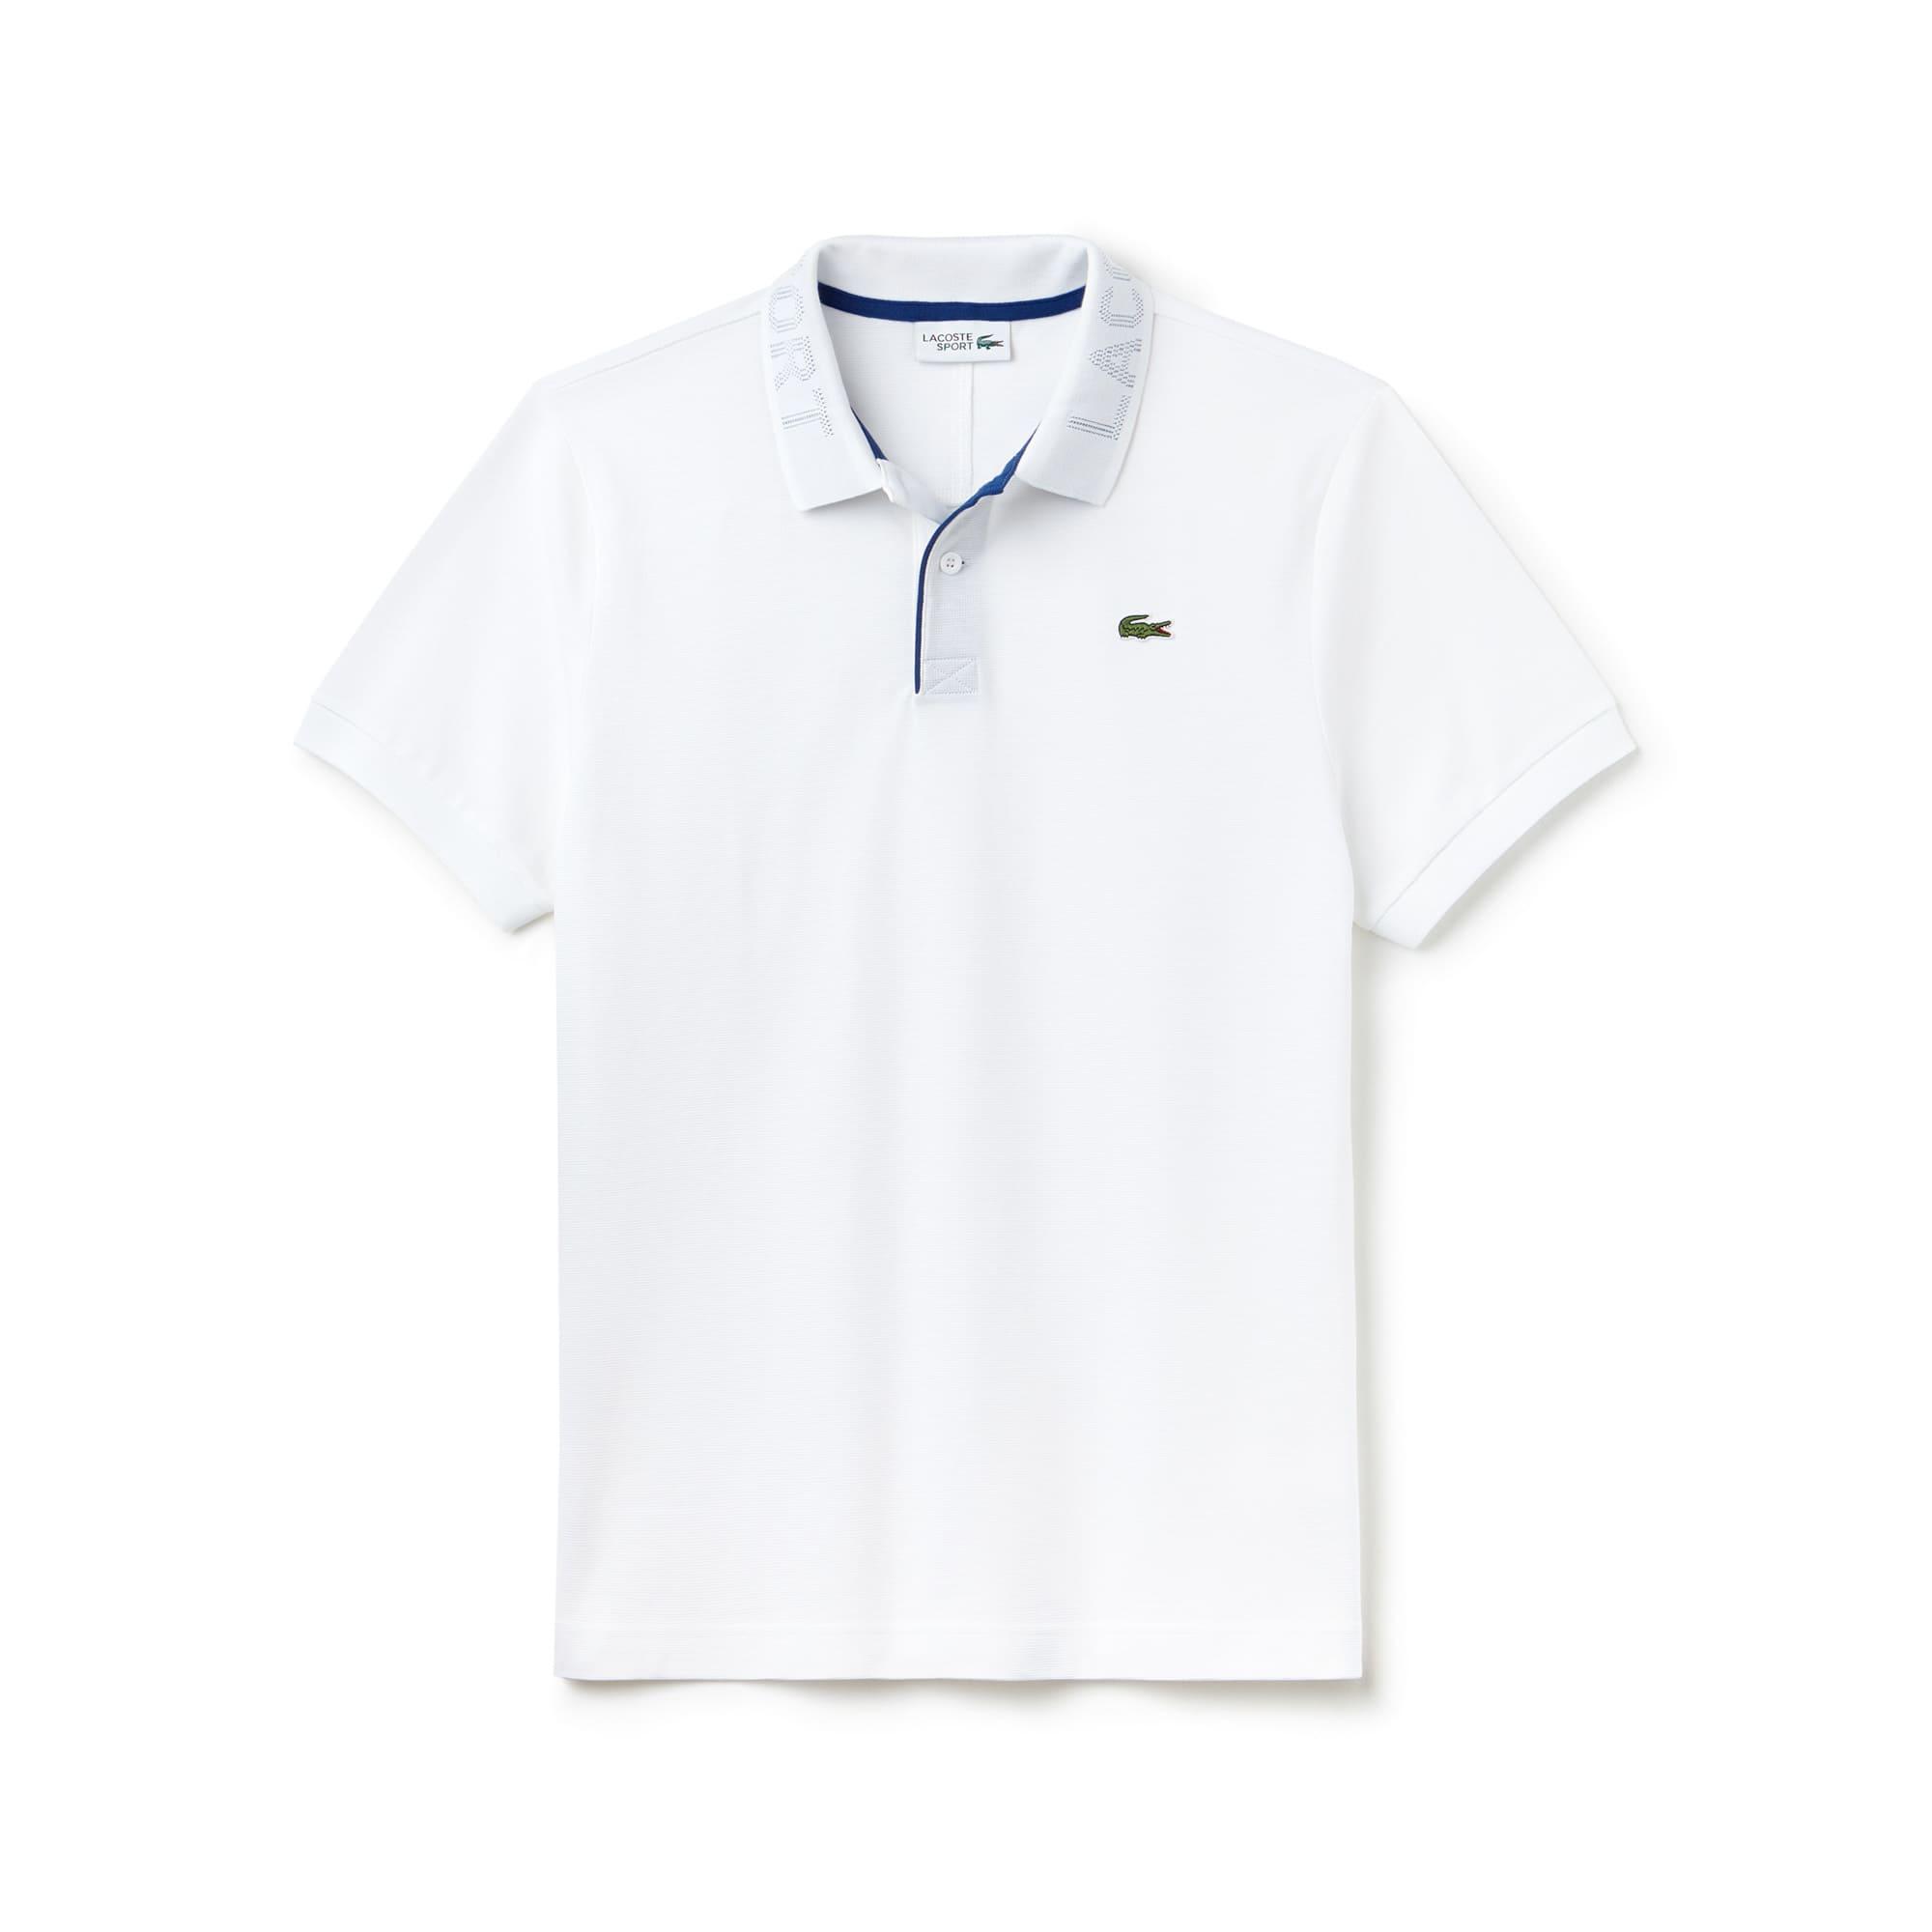 Men's Lacoste SPORT Print Collar Ultra-Light Cotton Tennis Polo Shirt